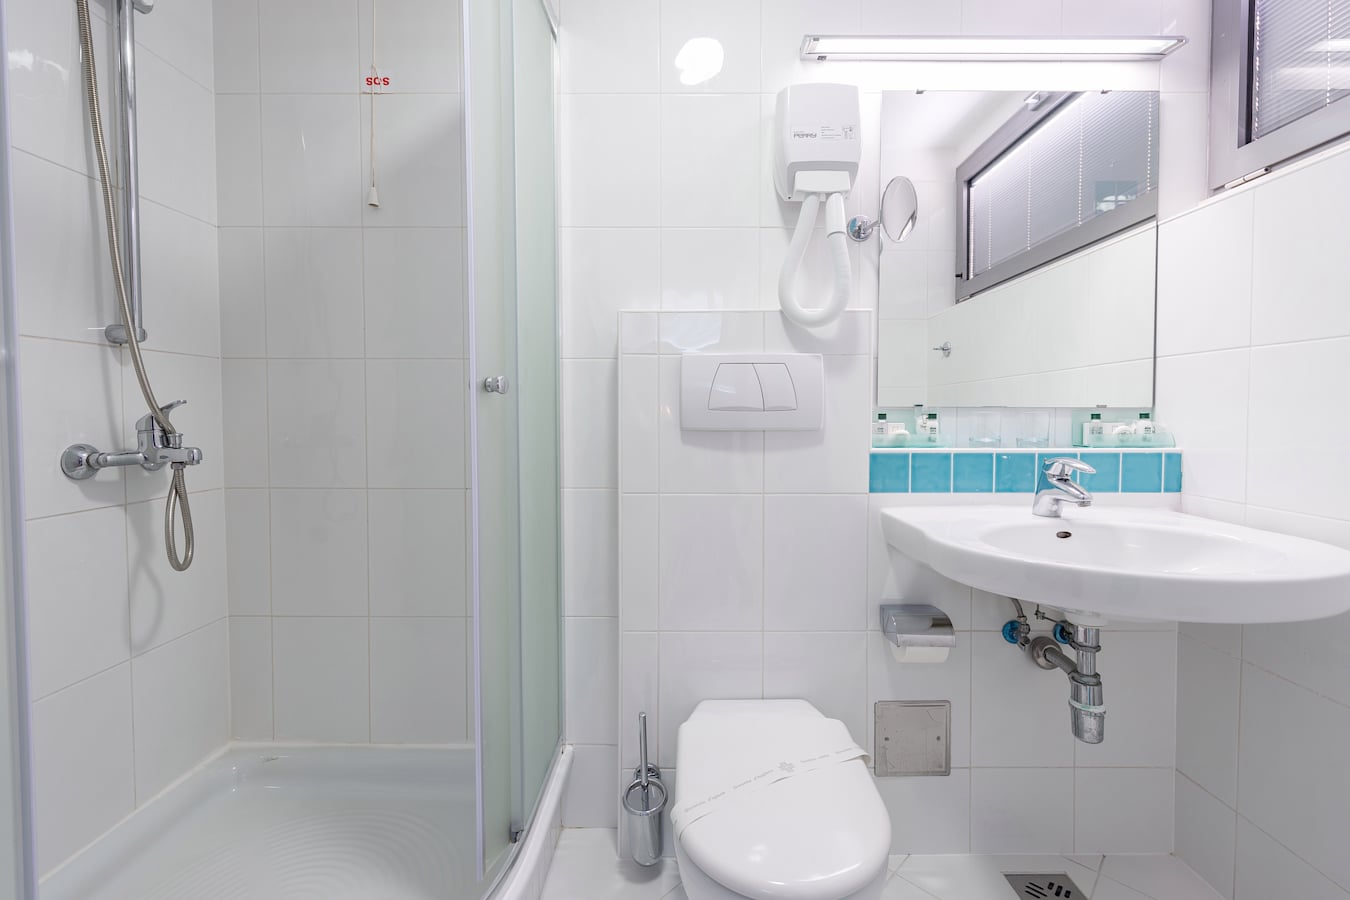 uvlala-hotel-room-bathroom-shower_1_2.jpg